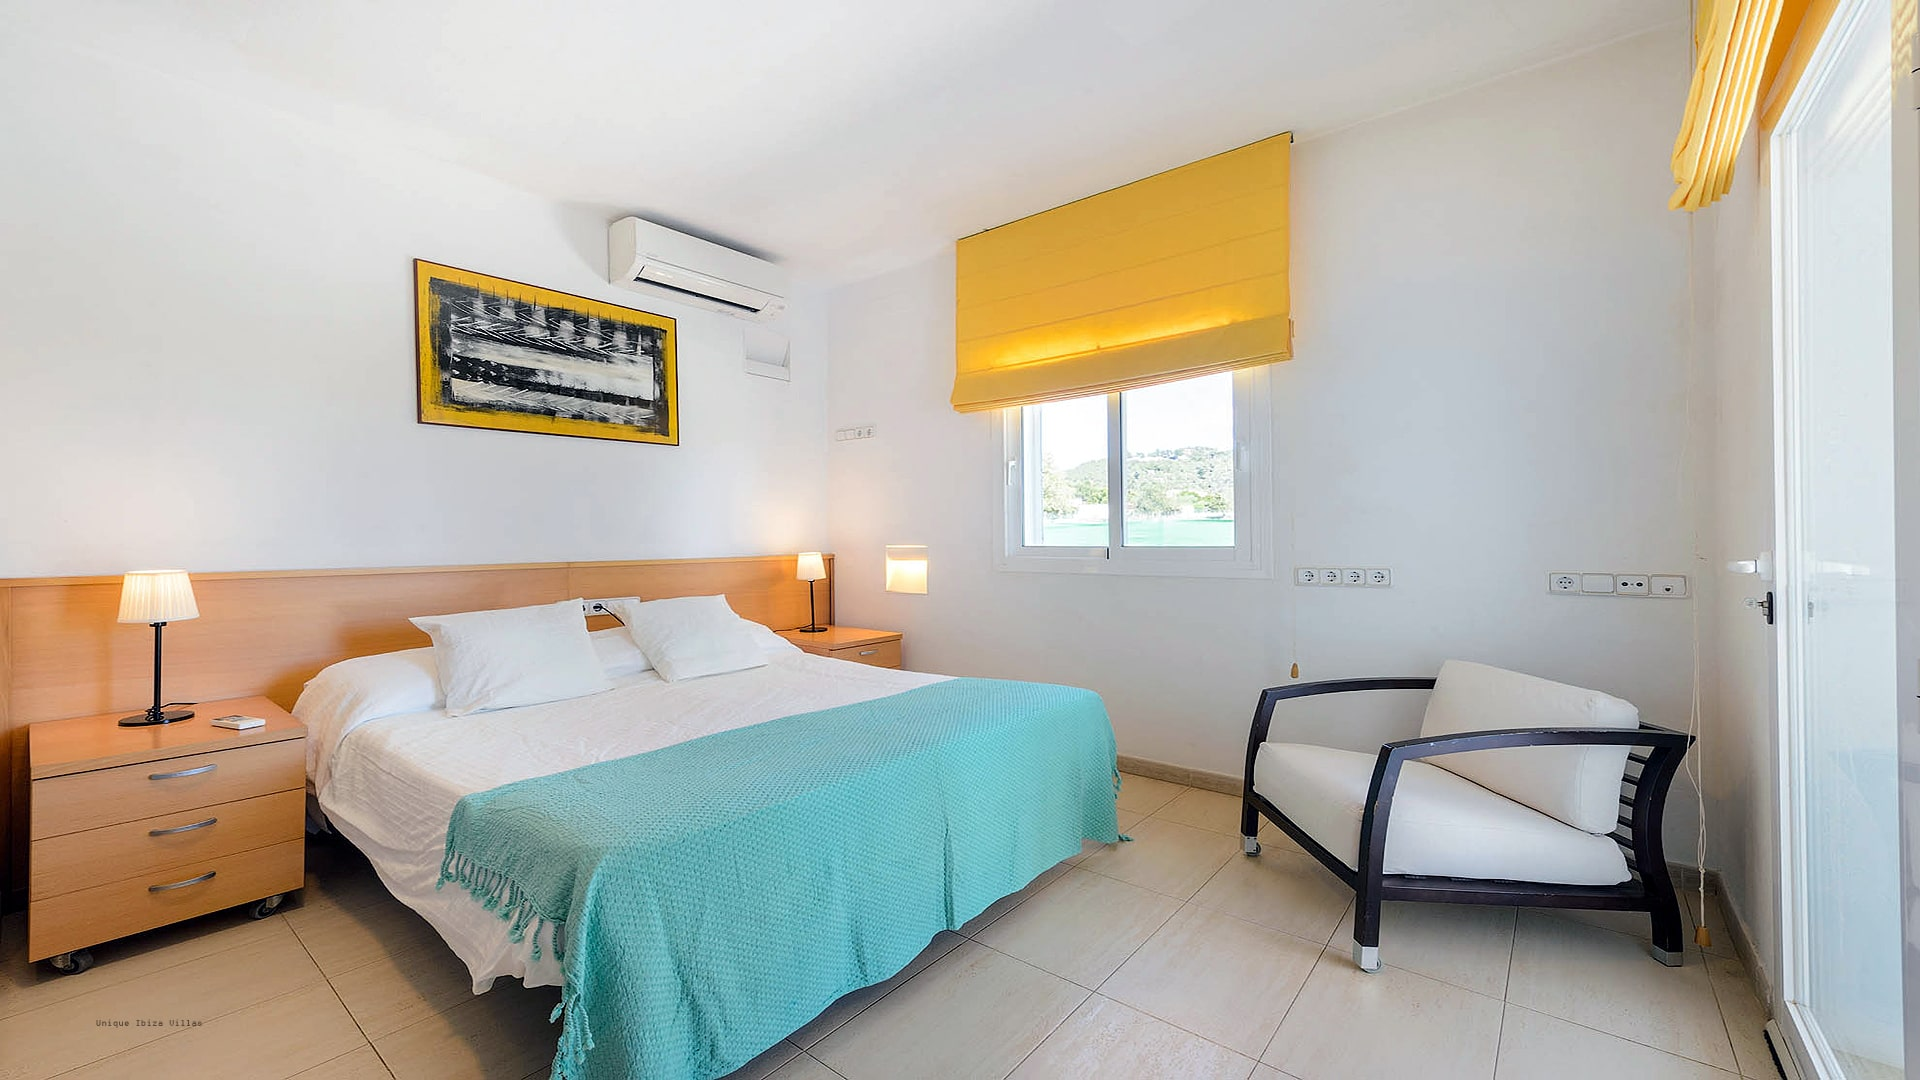 Villa Can Fluxa Ibiza 47 Bedroom 4